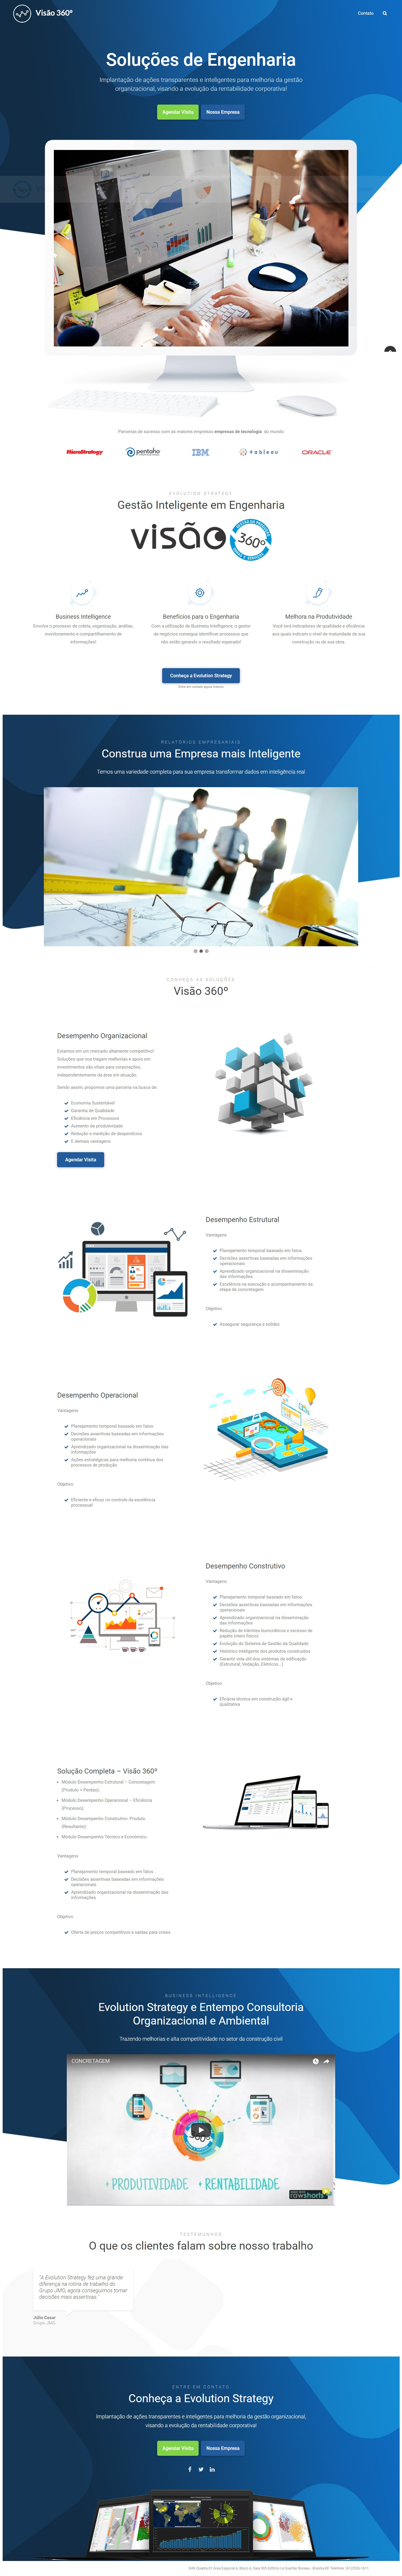 Engenharia – Visão 360º-brasilia-tecnologia-it-sites-websites